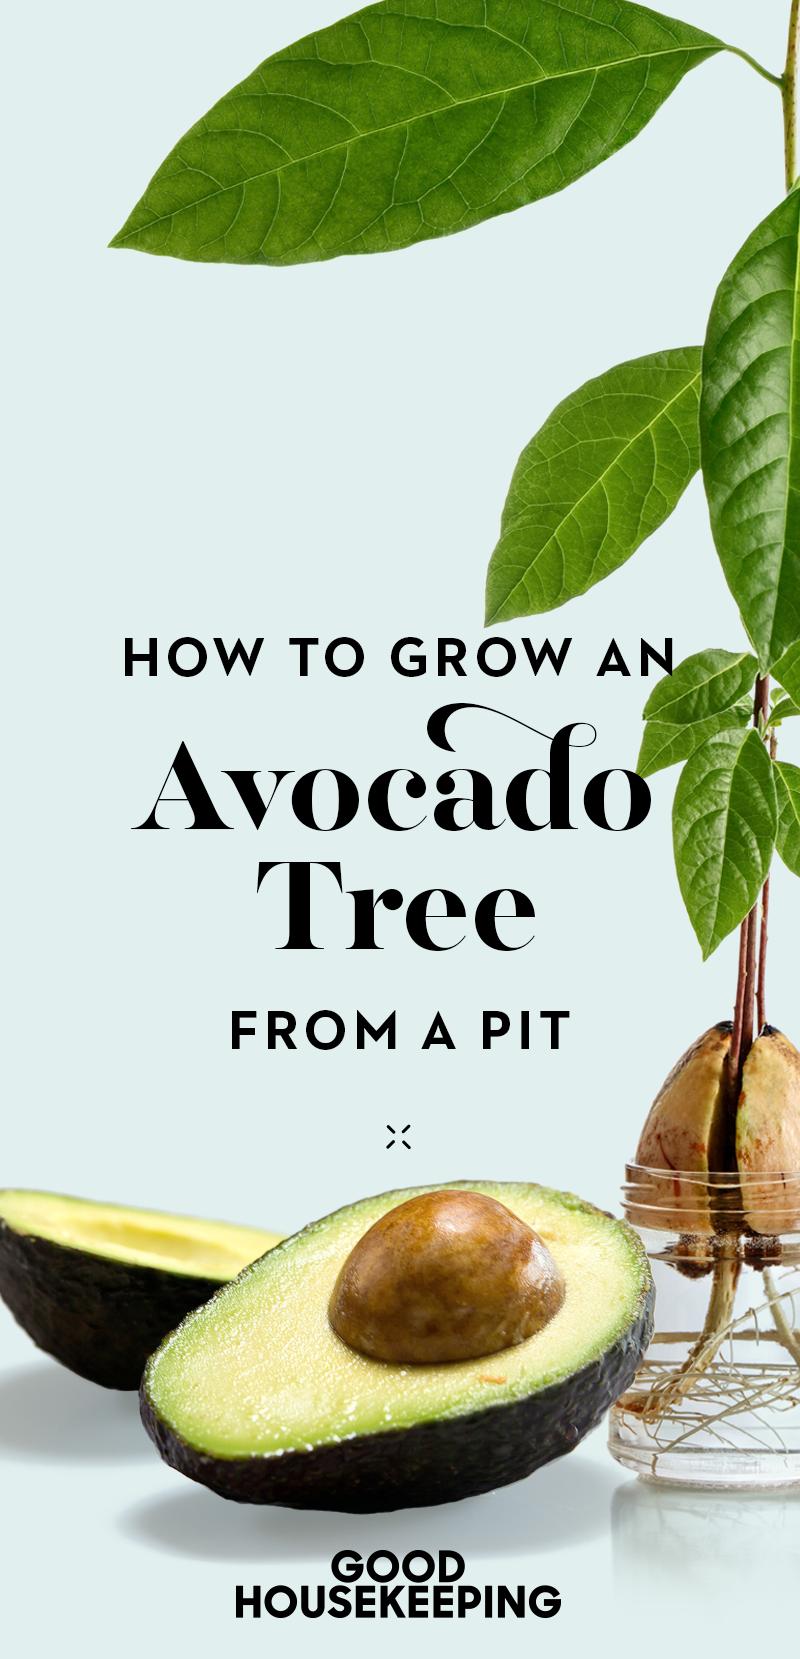 How To Grow An Avocado Tree From An Avocado Pit Grow Avocado Growing An Avocado Tree Avocado Plant